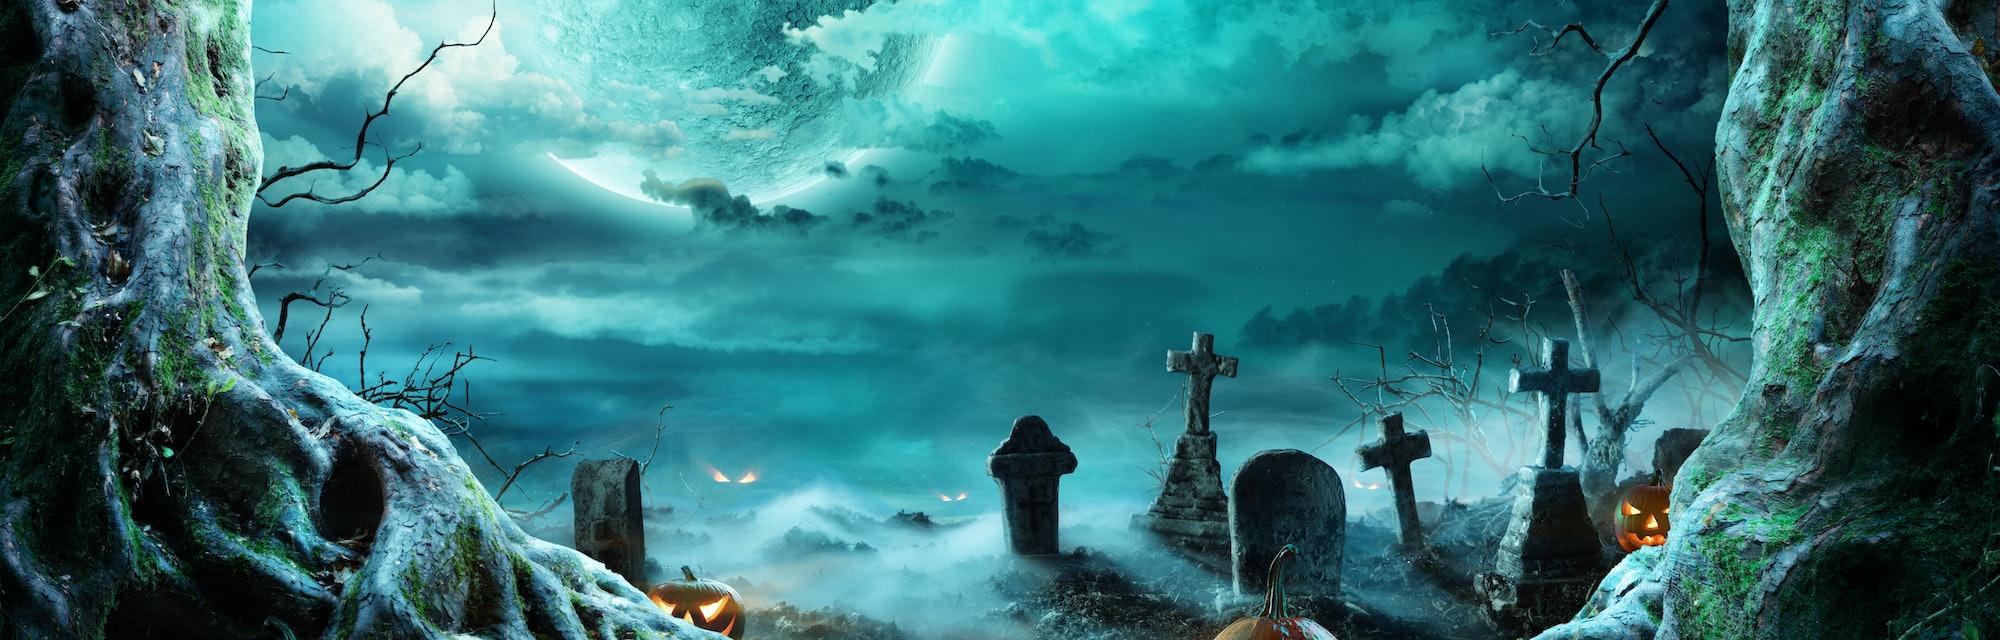 Jack 'O Lantern In Cemetery In Spooky Night With Full Moon - Halloween